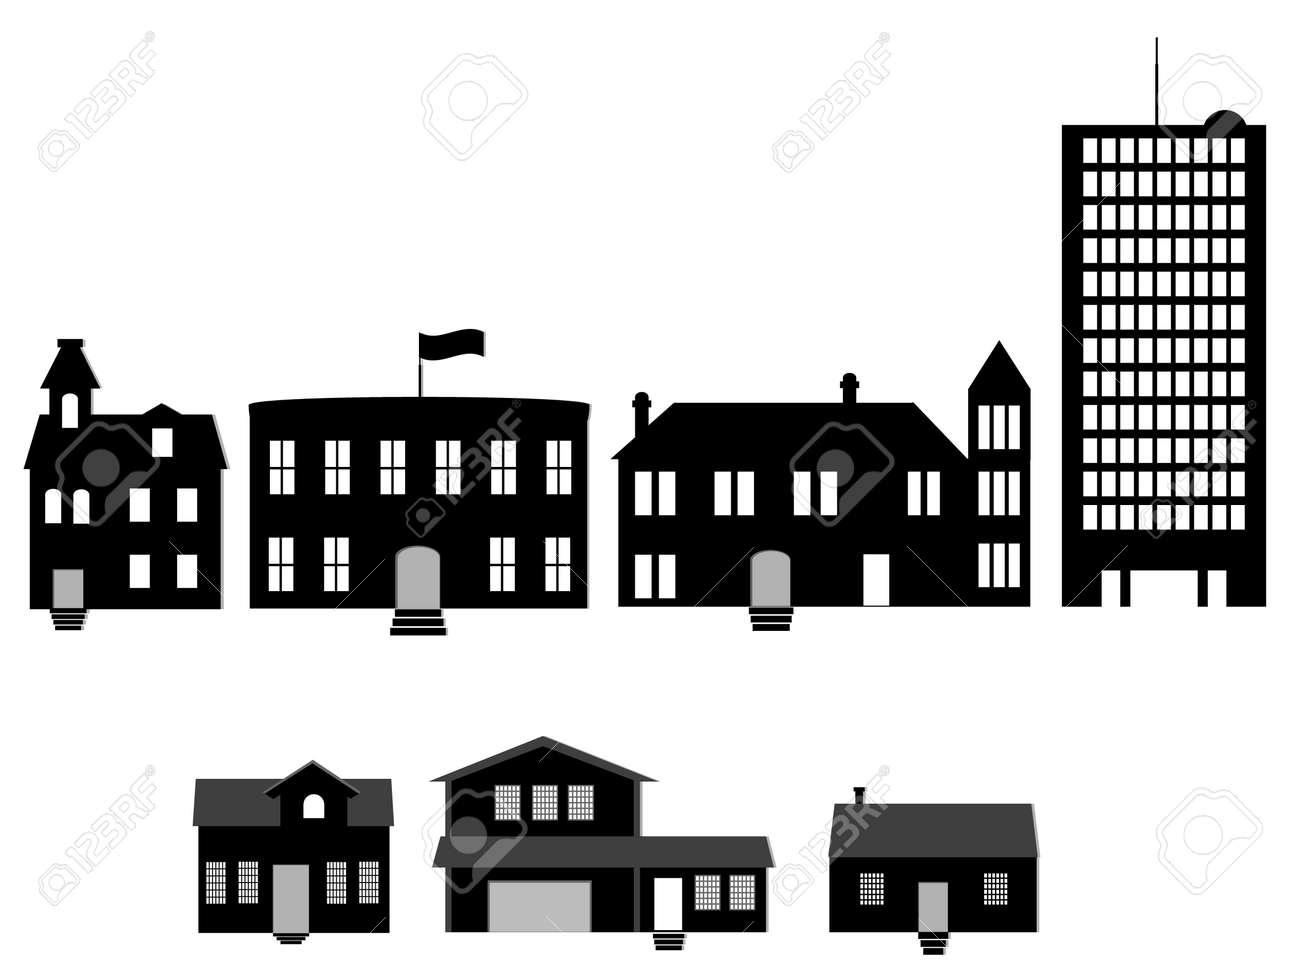 houses illustration Stock Vector - 4141194